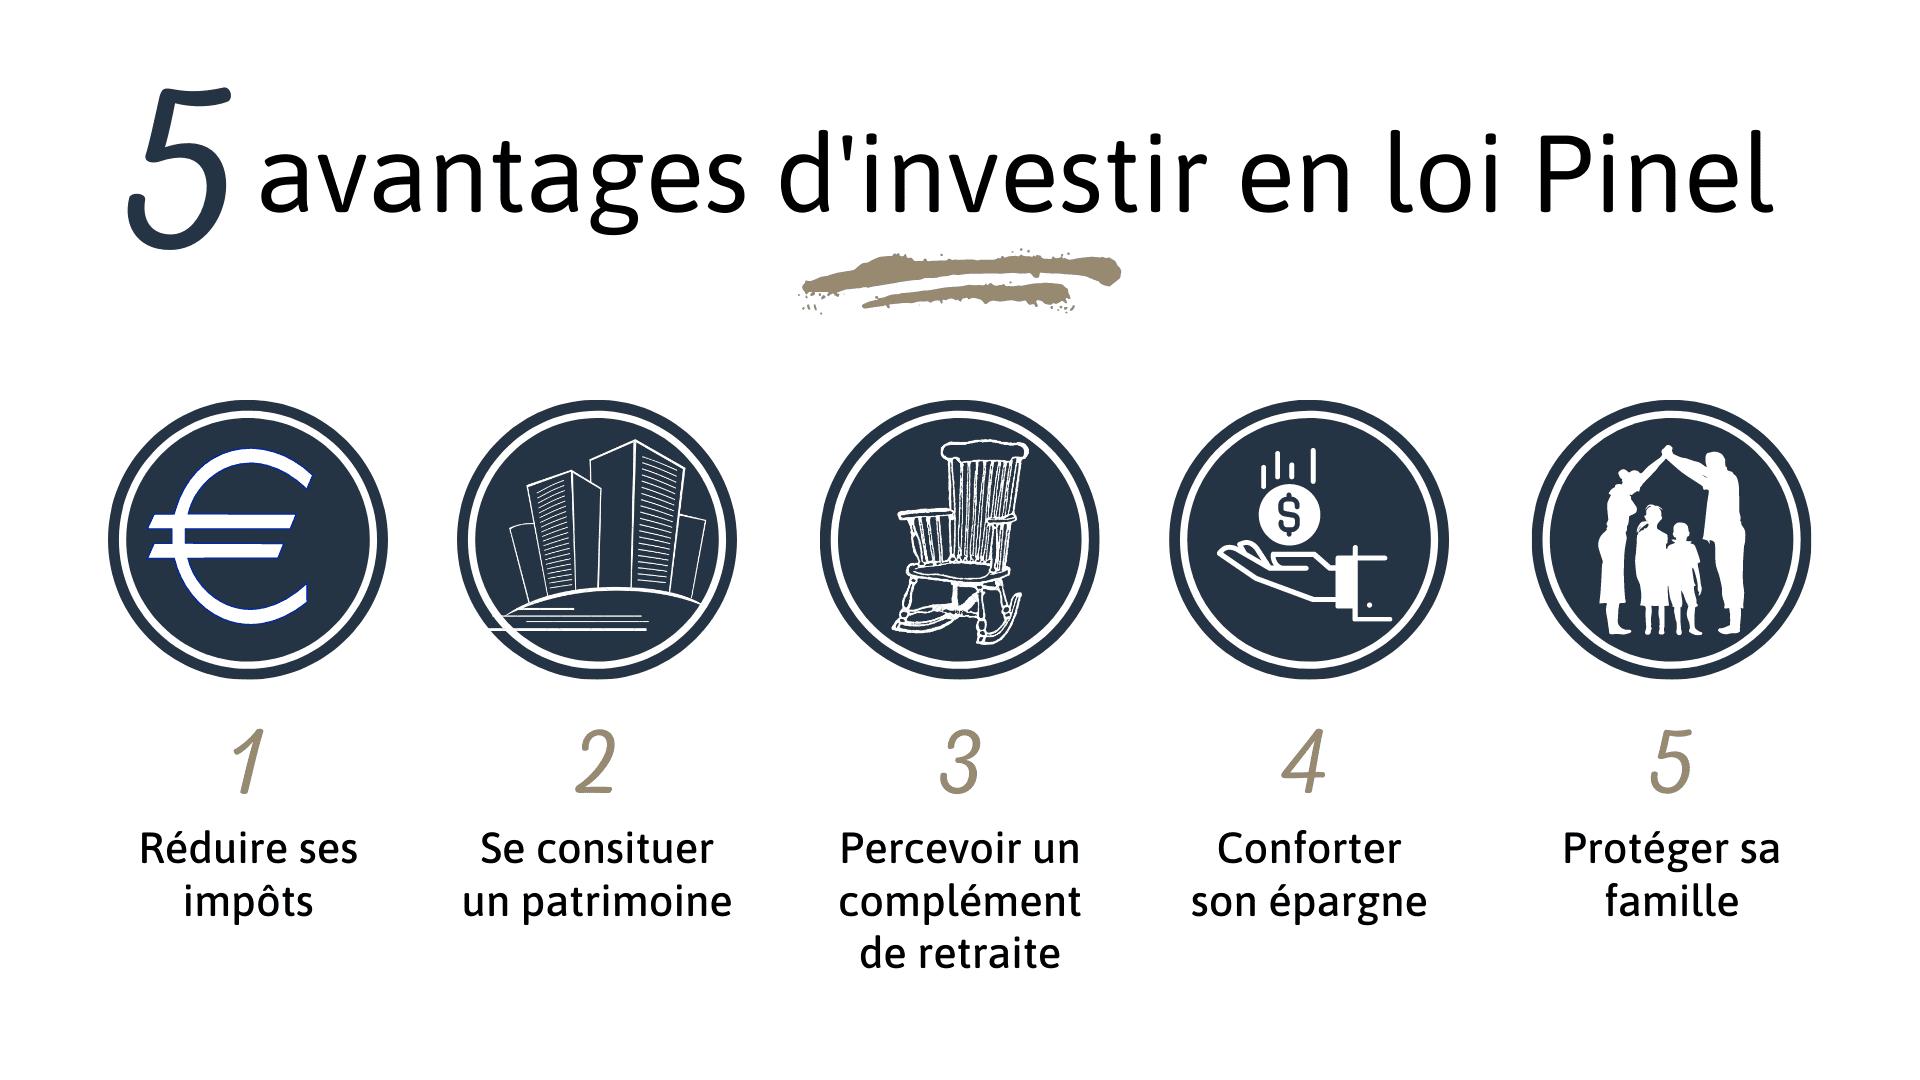 Investir-en-pinel-avantages